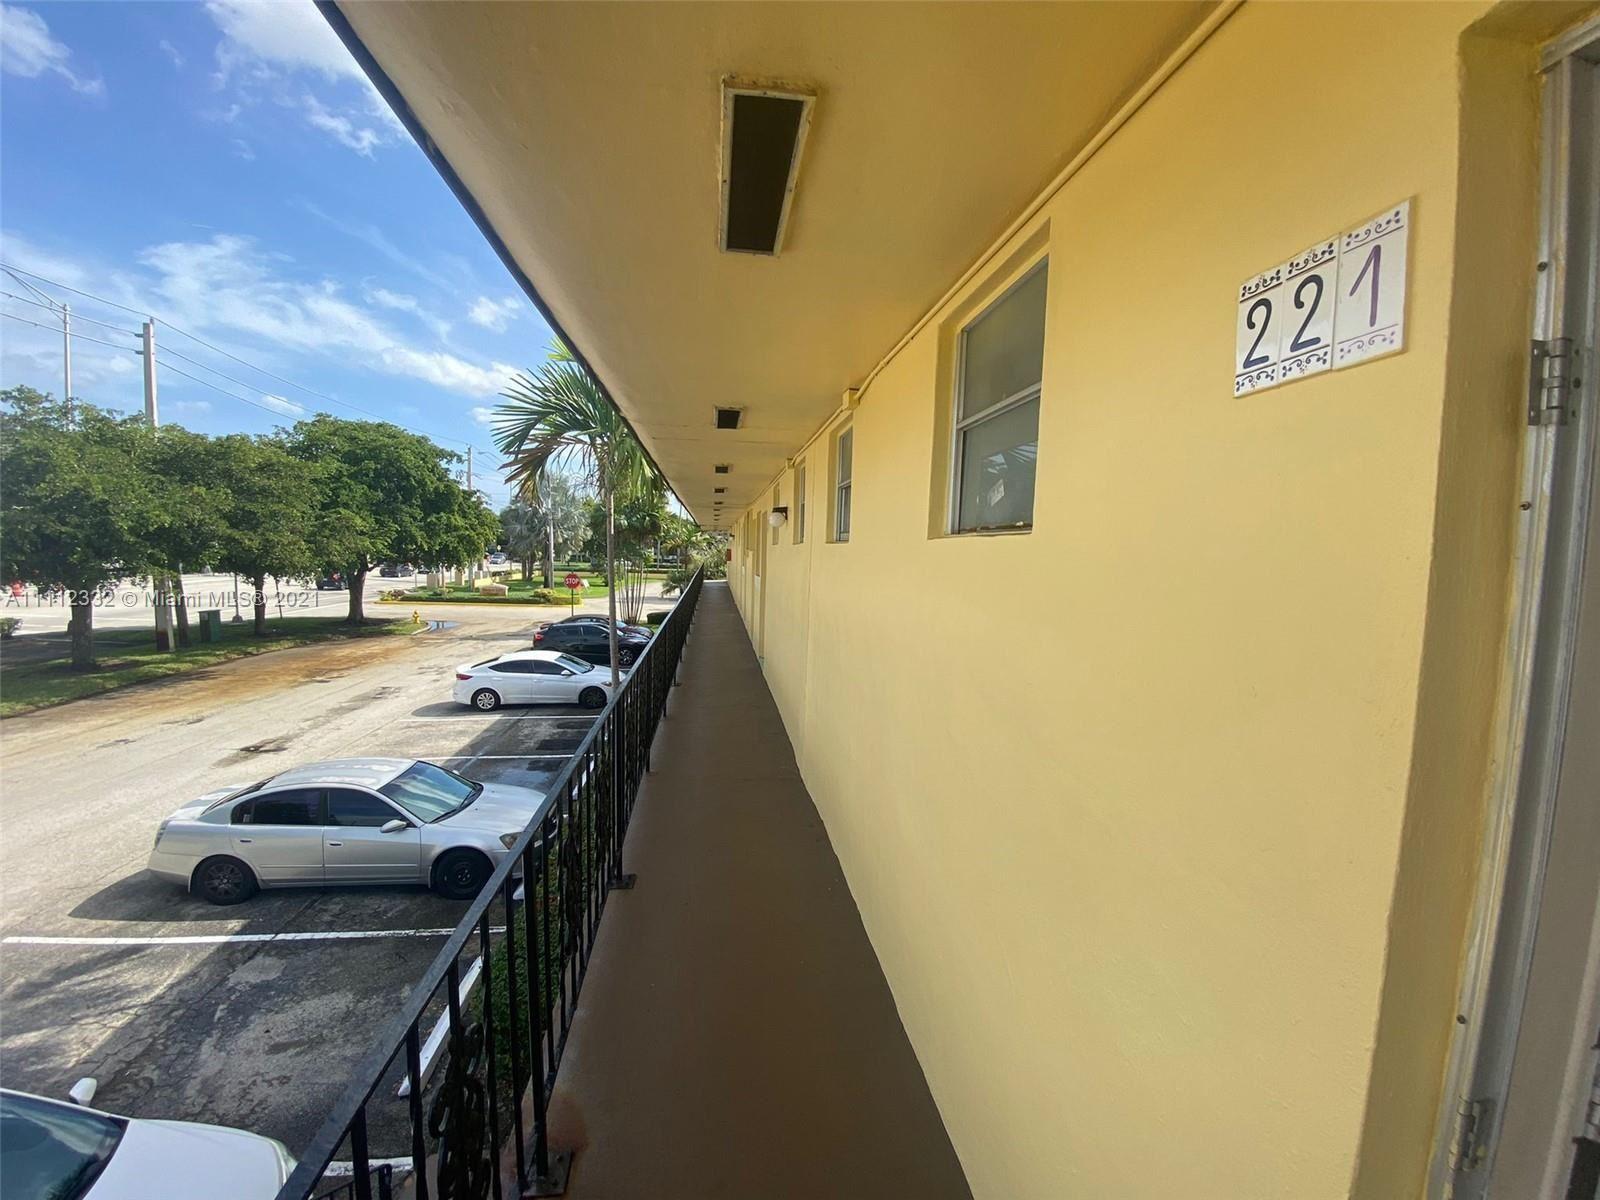 Photo of 2940 NE 203rd St #C221, Aventura, FL 33180 (MLS # A11112332)